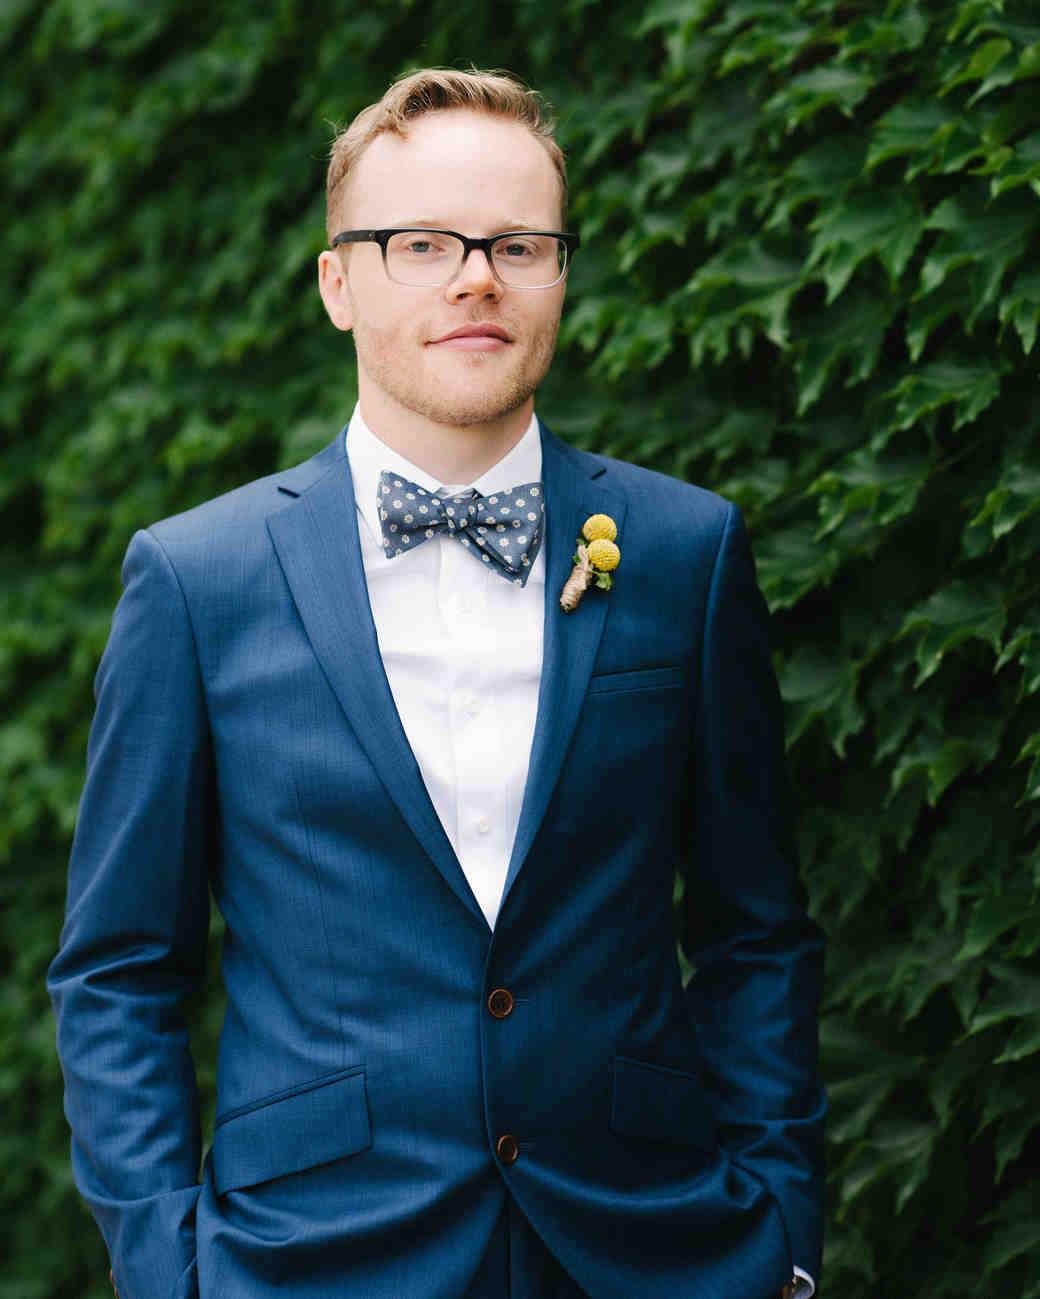 steph tim wedding groom blue suit